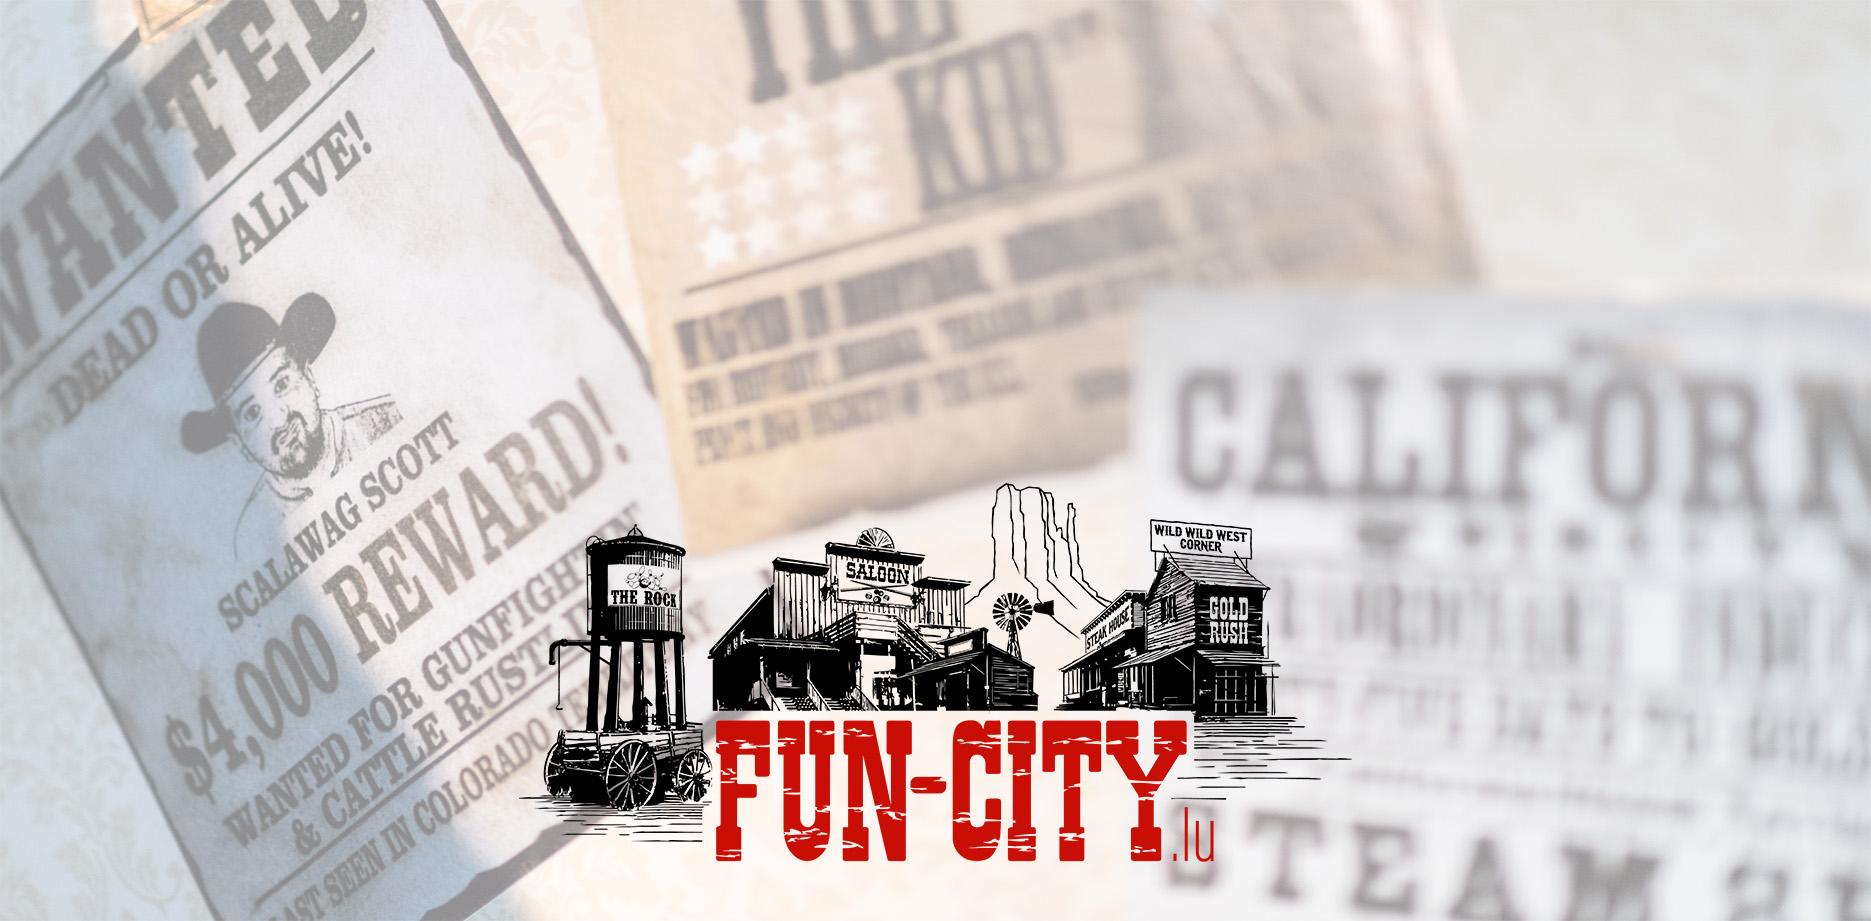 FunCity Homepage